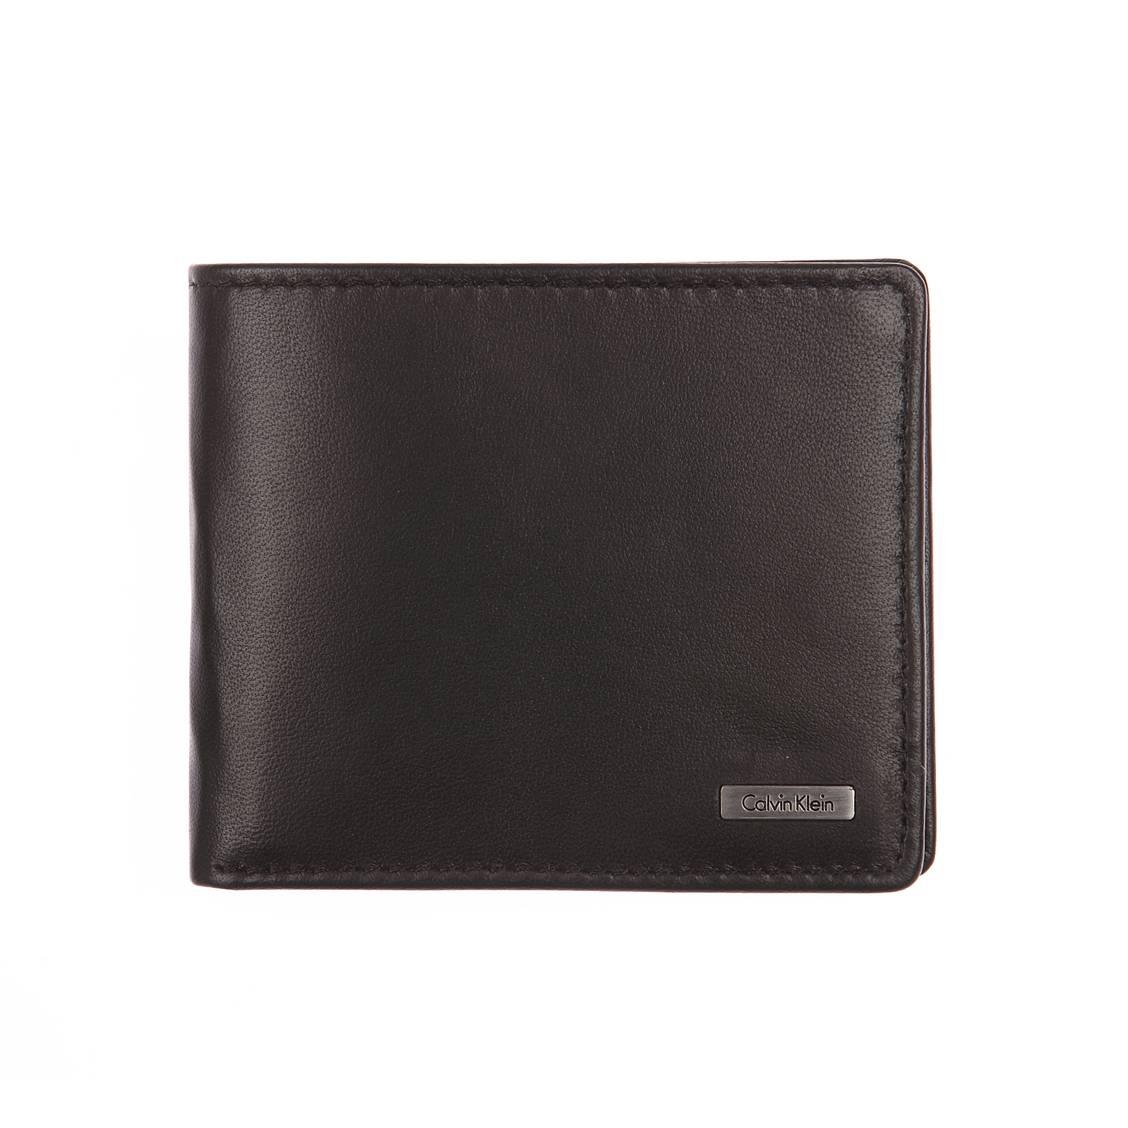 Portefeuille européen Calvin Klein Jeans Rail en cuir lisse noir FKIIFOq2